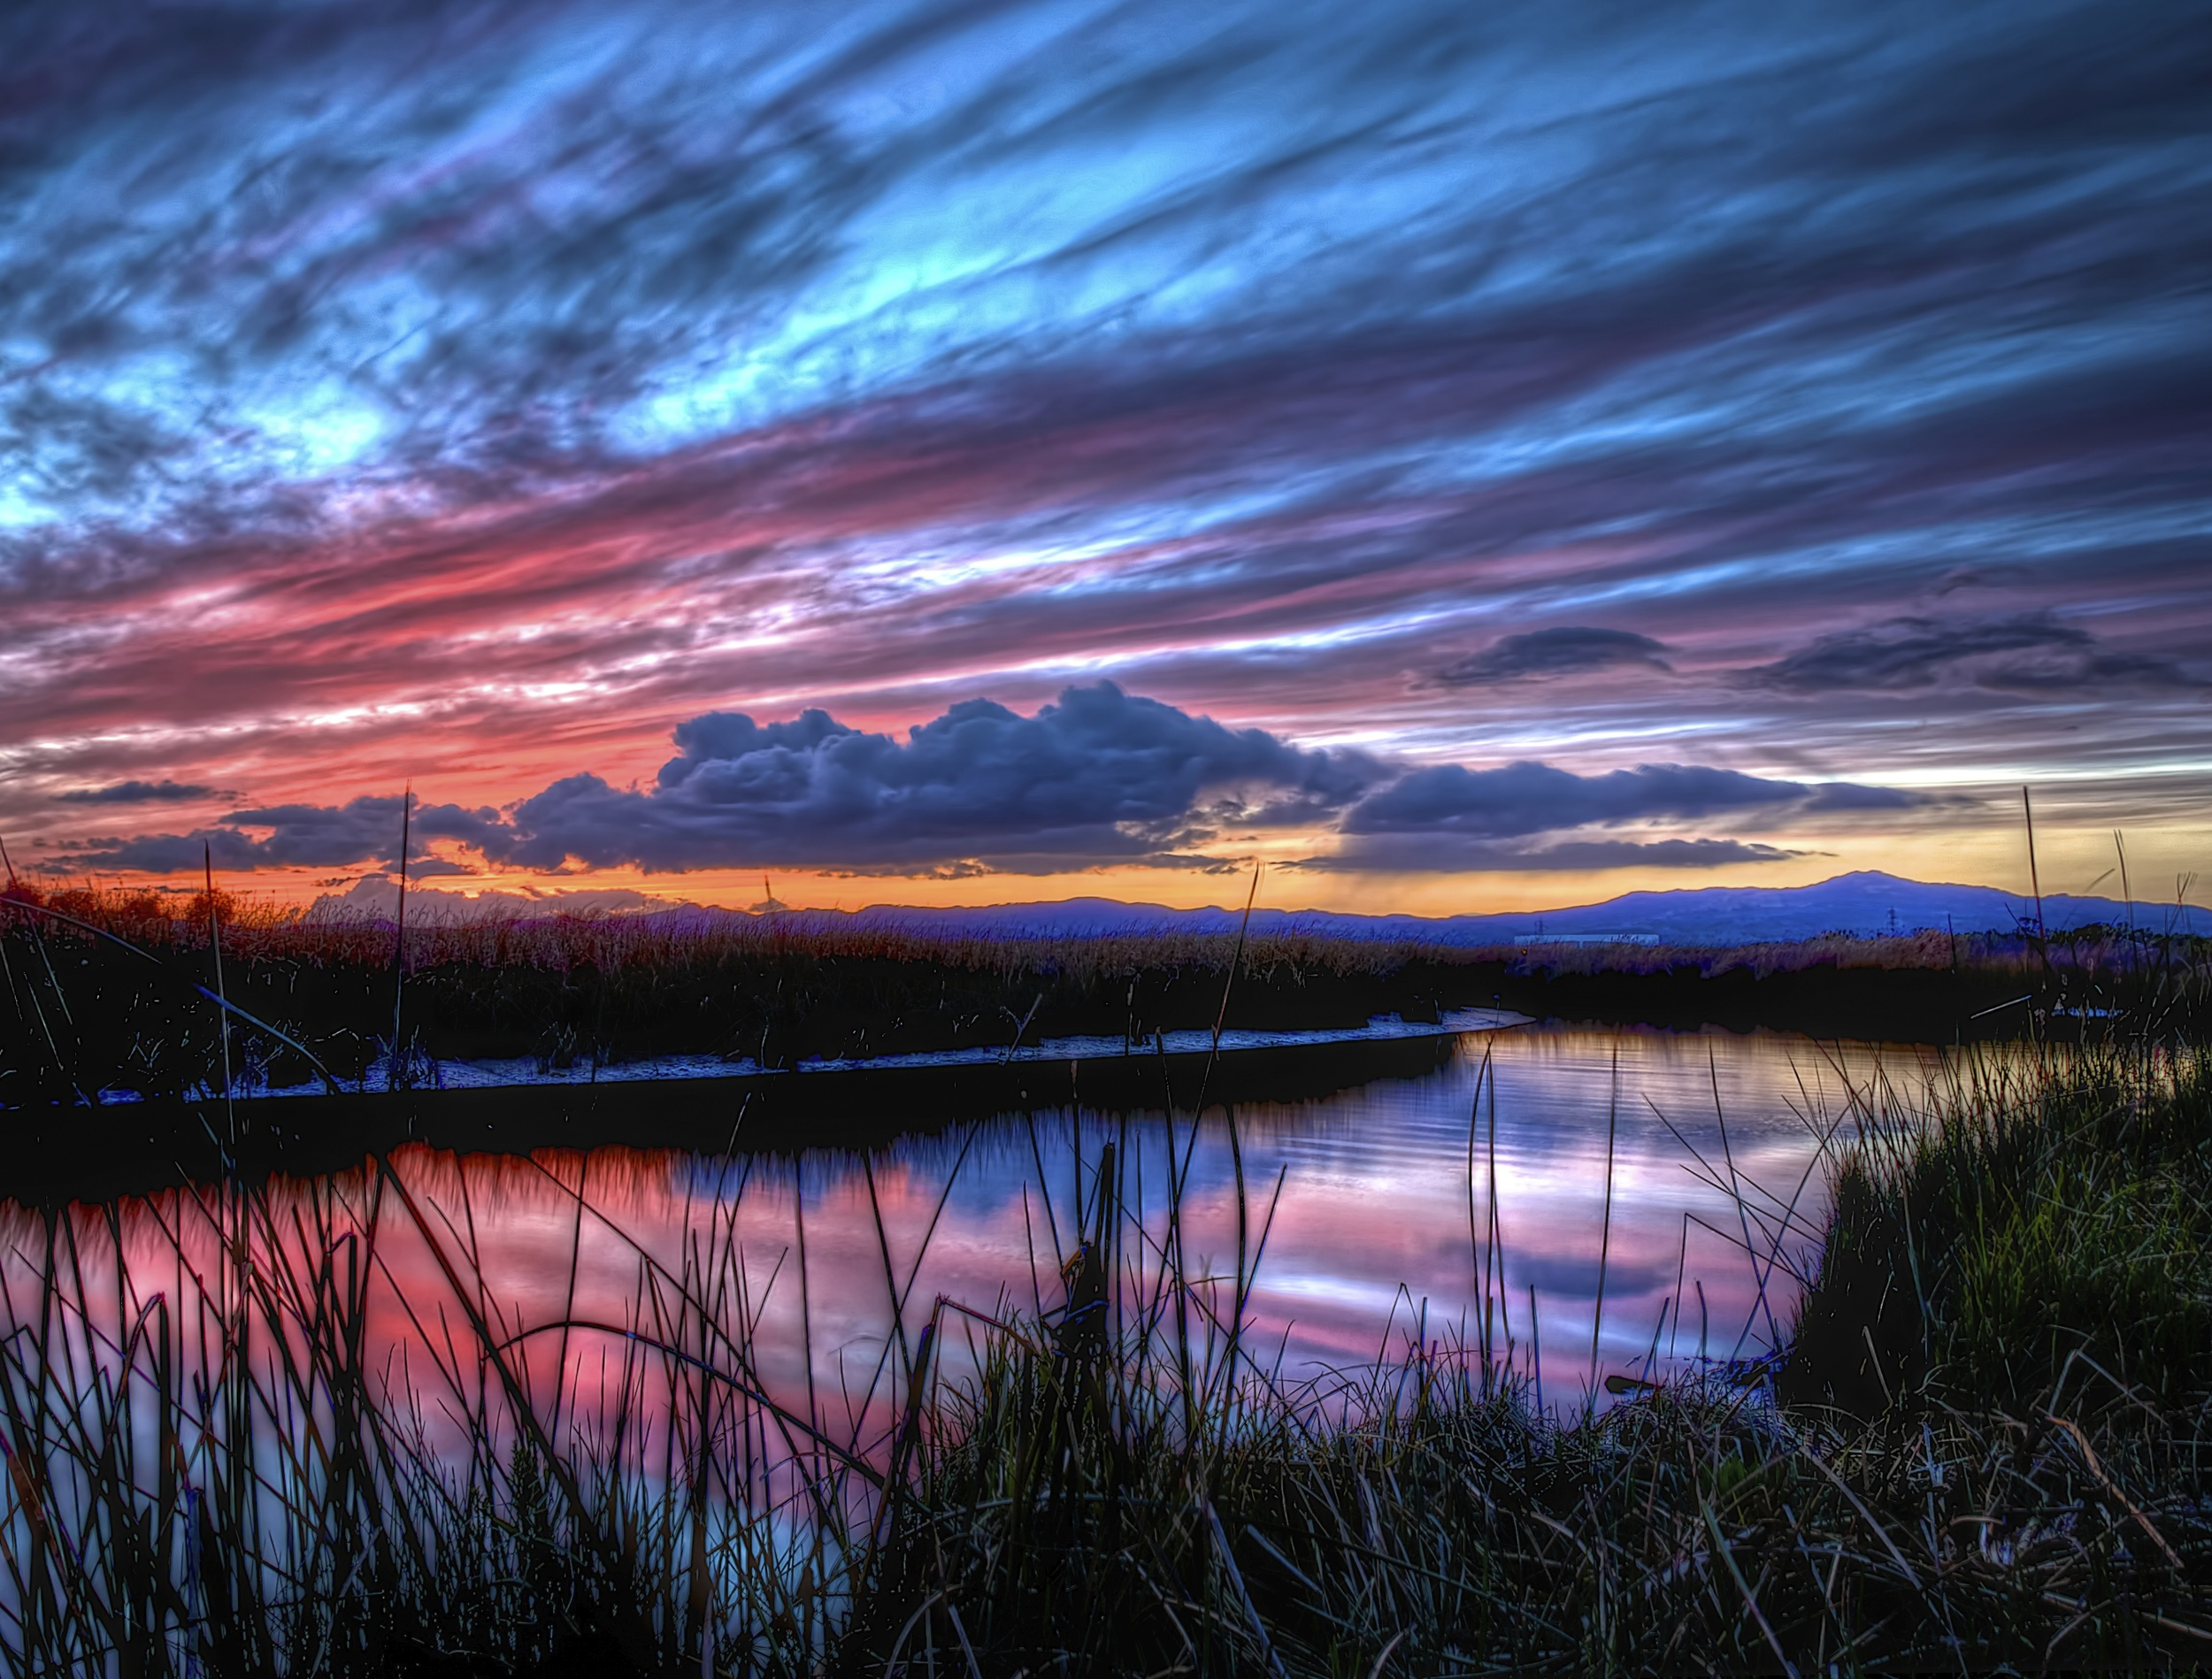 Sunset in Suisun Marsh